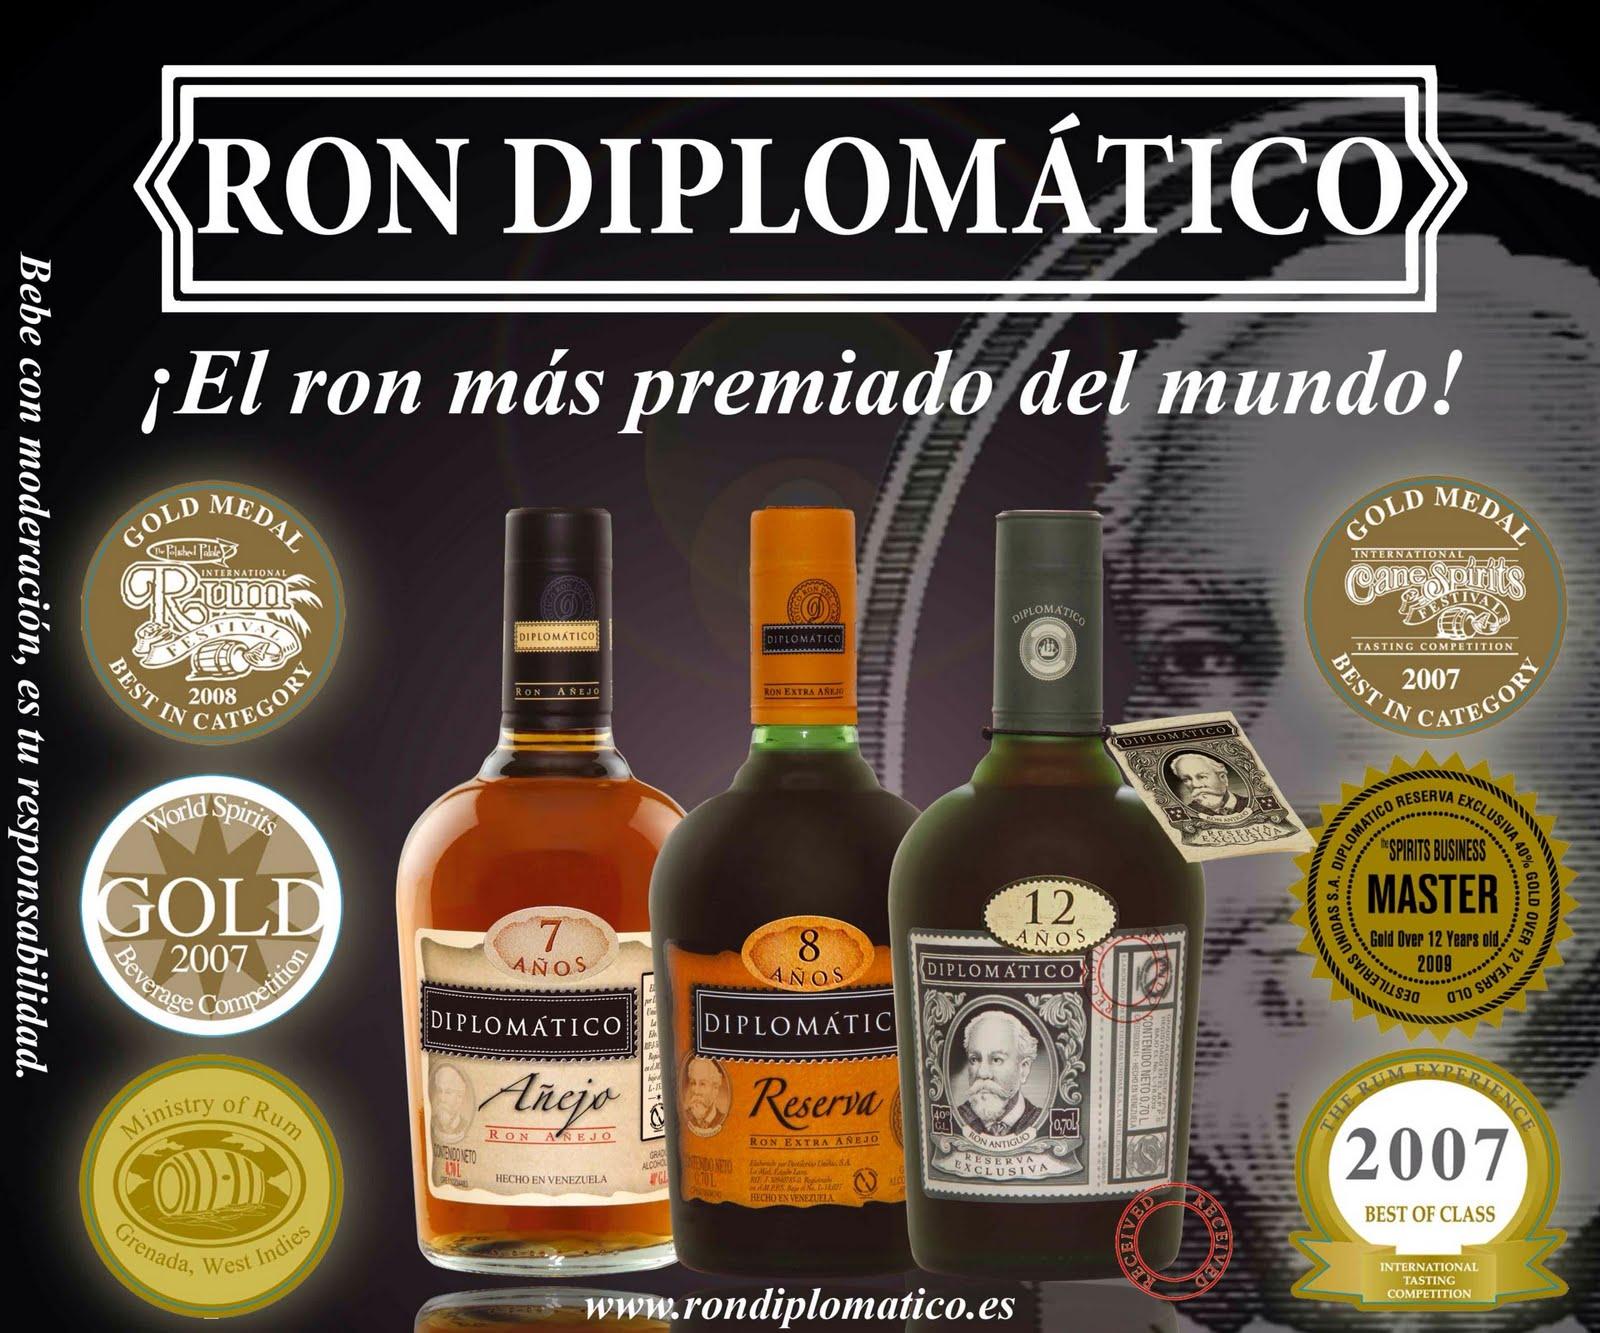 RUM Diplomatico banner